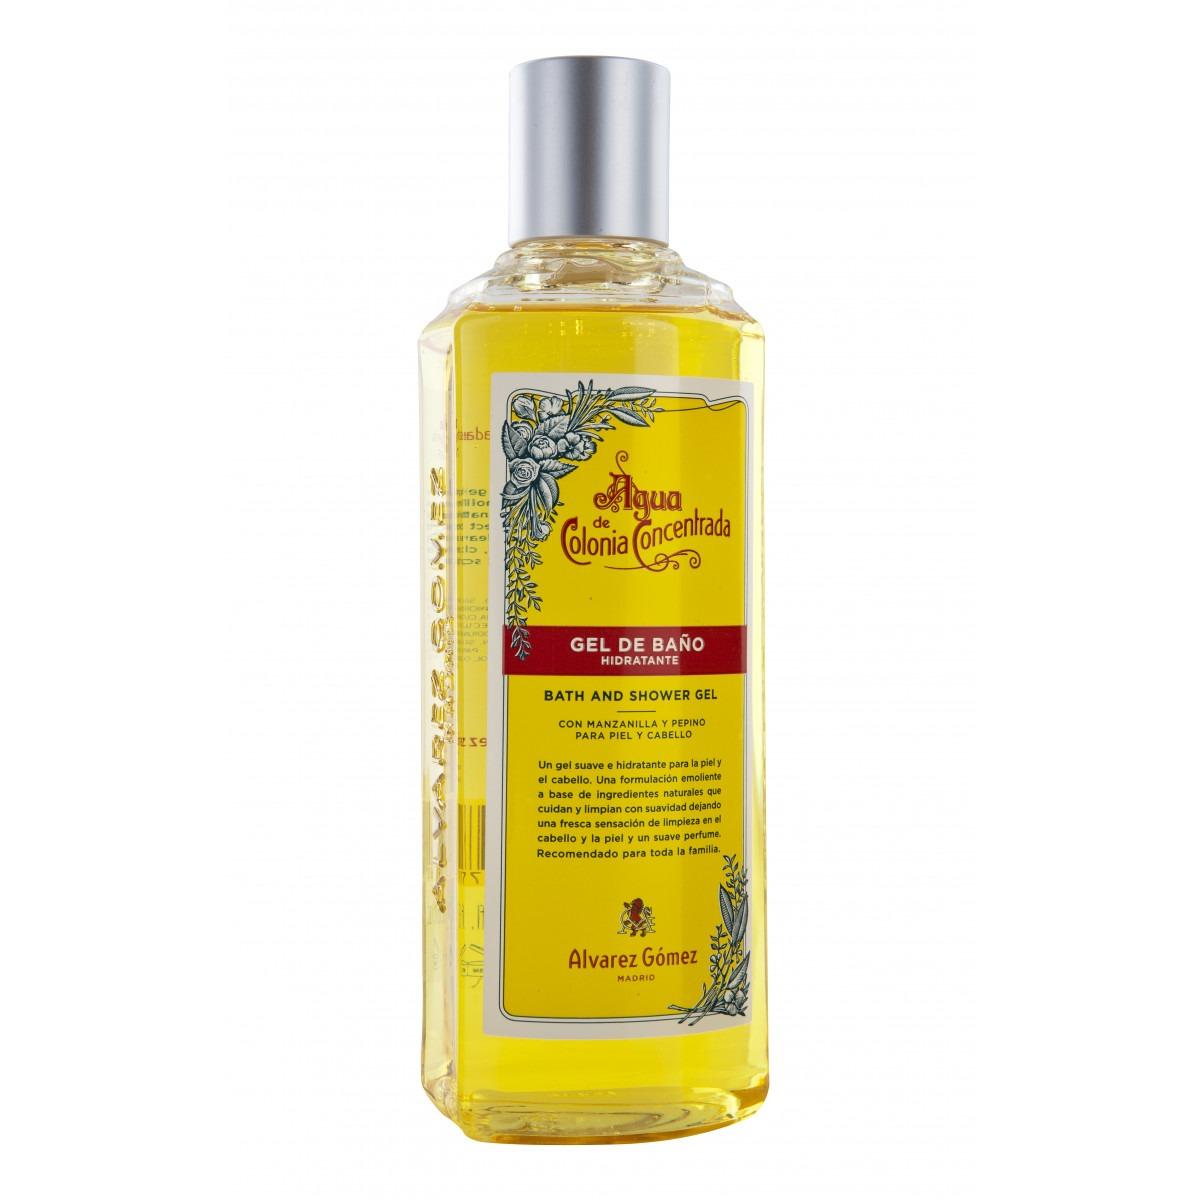 Alvarez Gomez Aqua de Colonia bath & shower gel 300ml